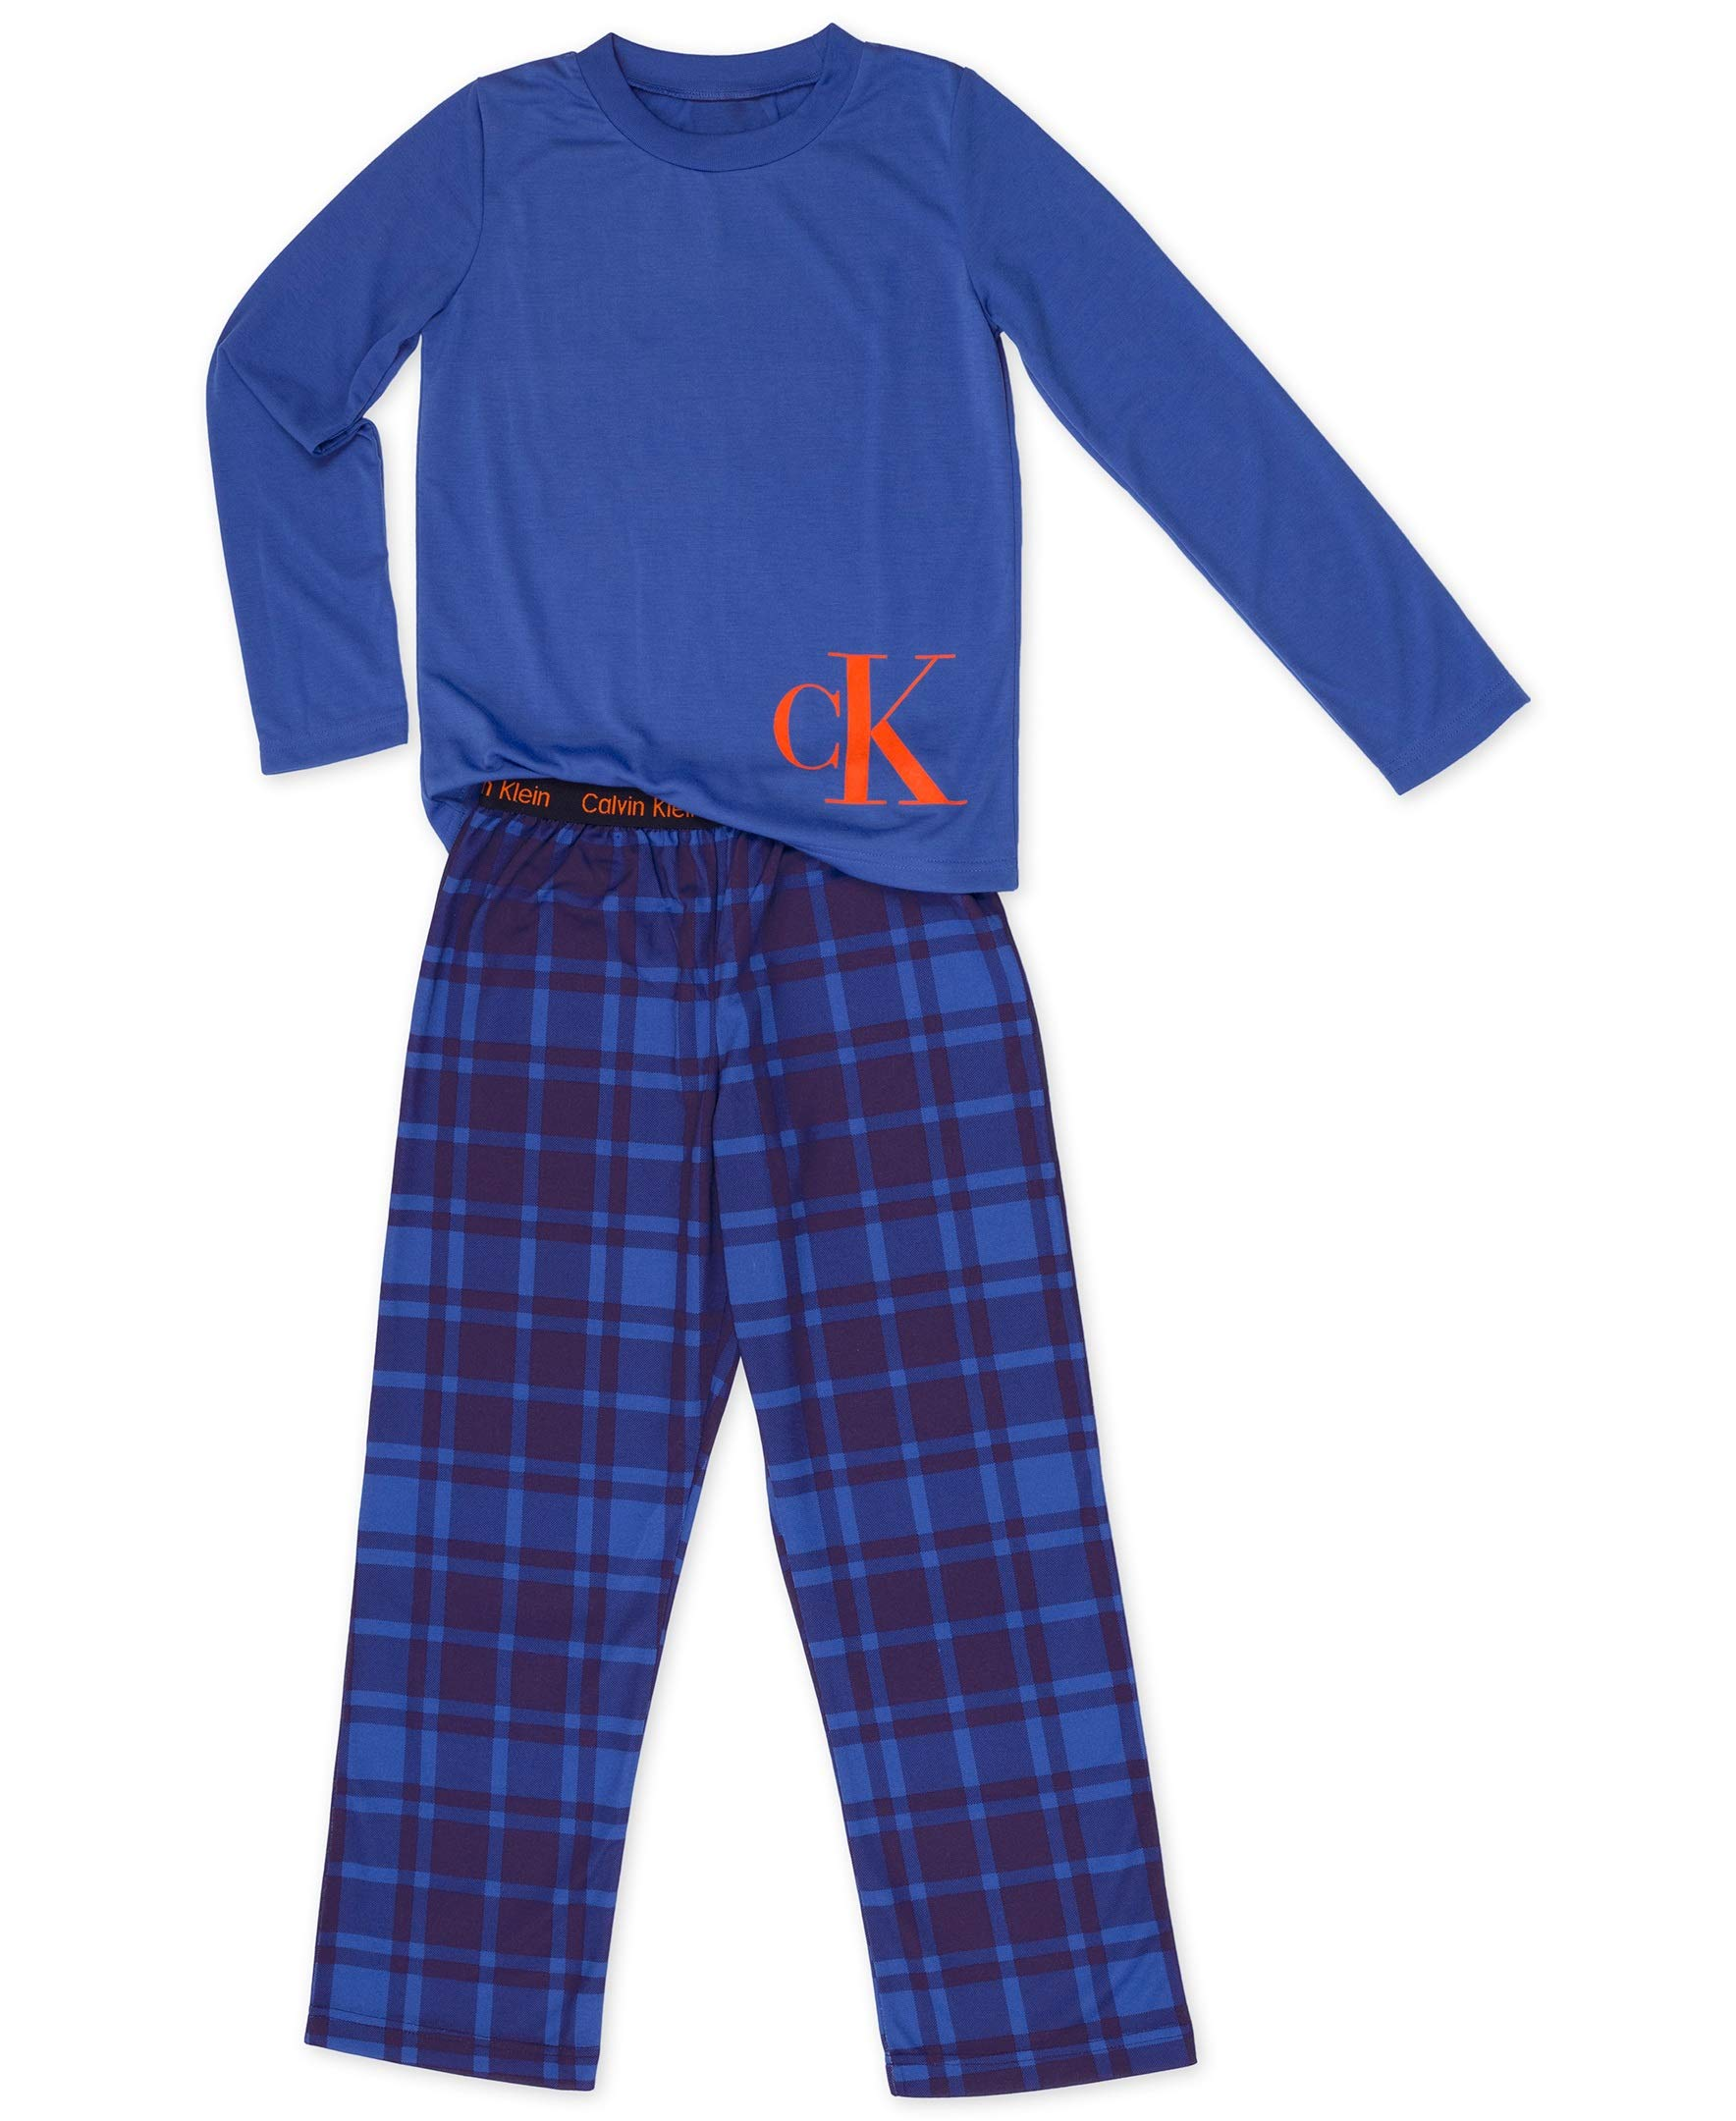 Calvin Klein Big Boys' 2 Piece Sleepwear Top and Bottom Pajama Set Pj, Long Sleeve - Victoria Forest Plaid Blue, X-Large - 14/16